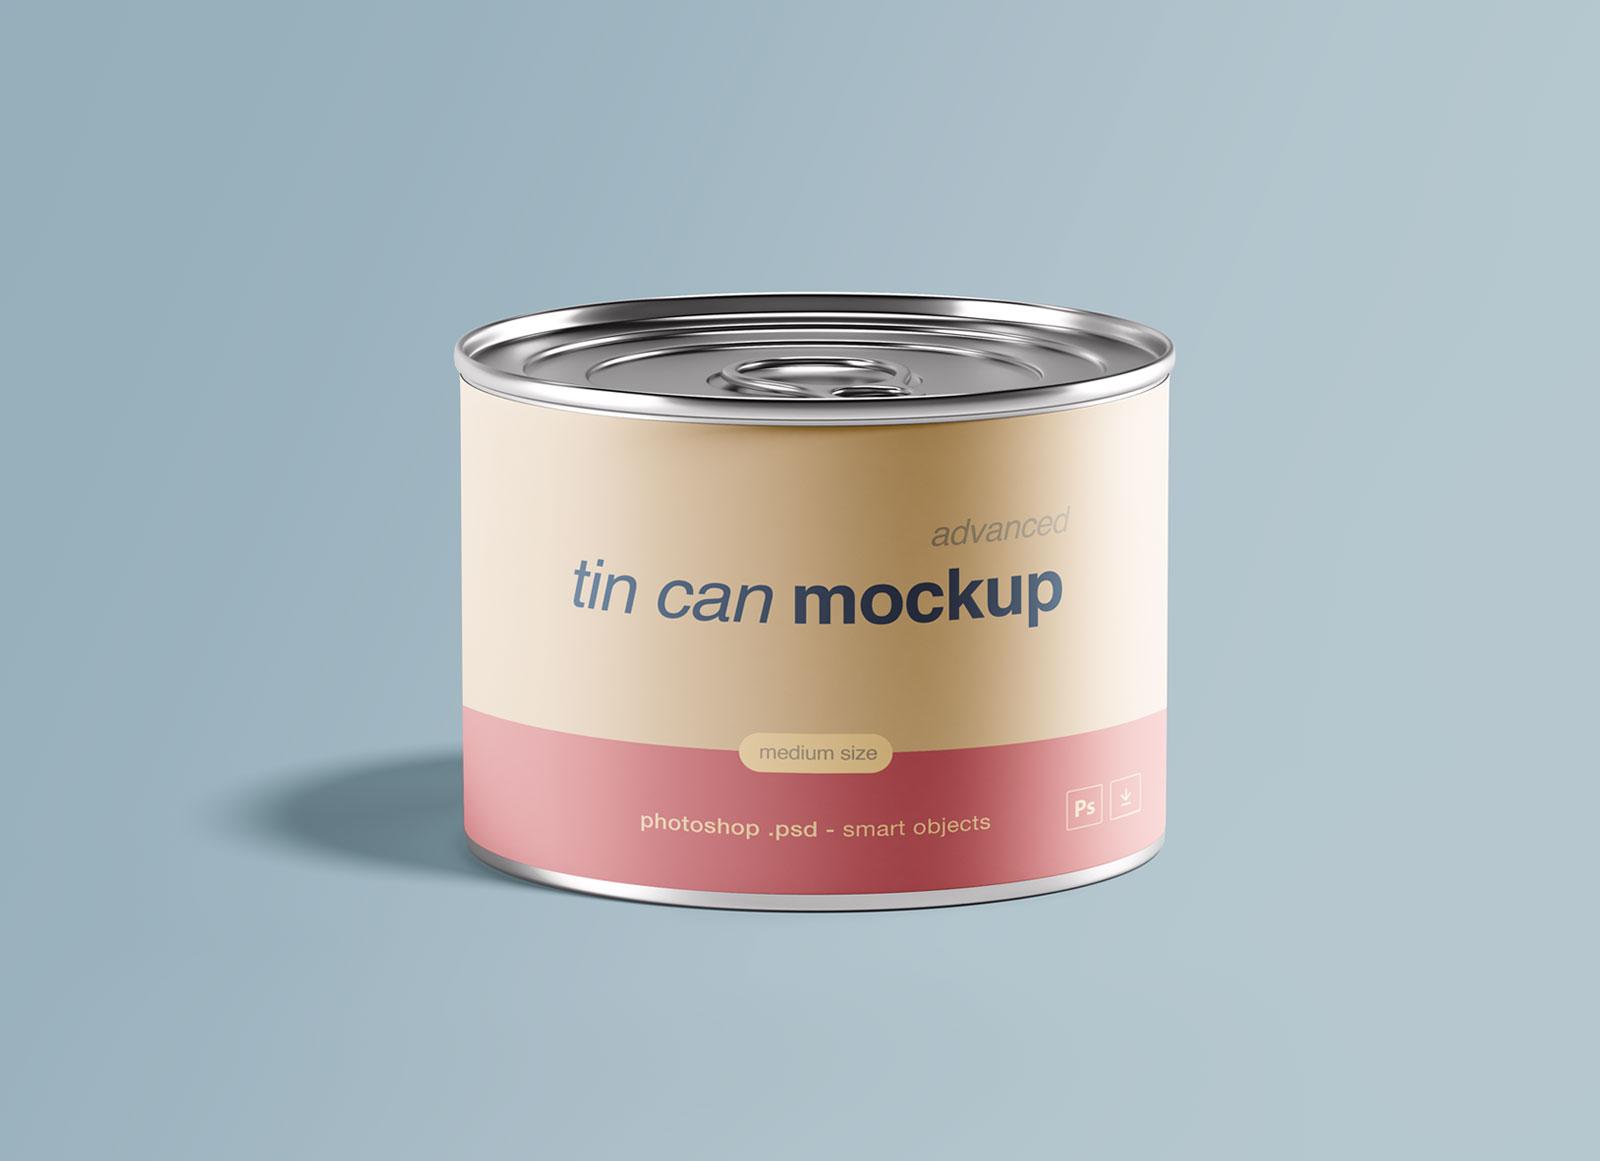 Free-medium-Size-Food-Tin-Can-Mockup-PSD